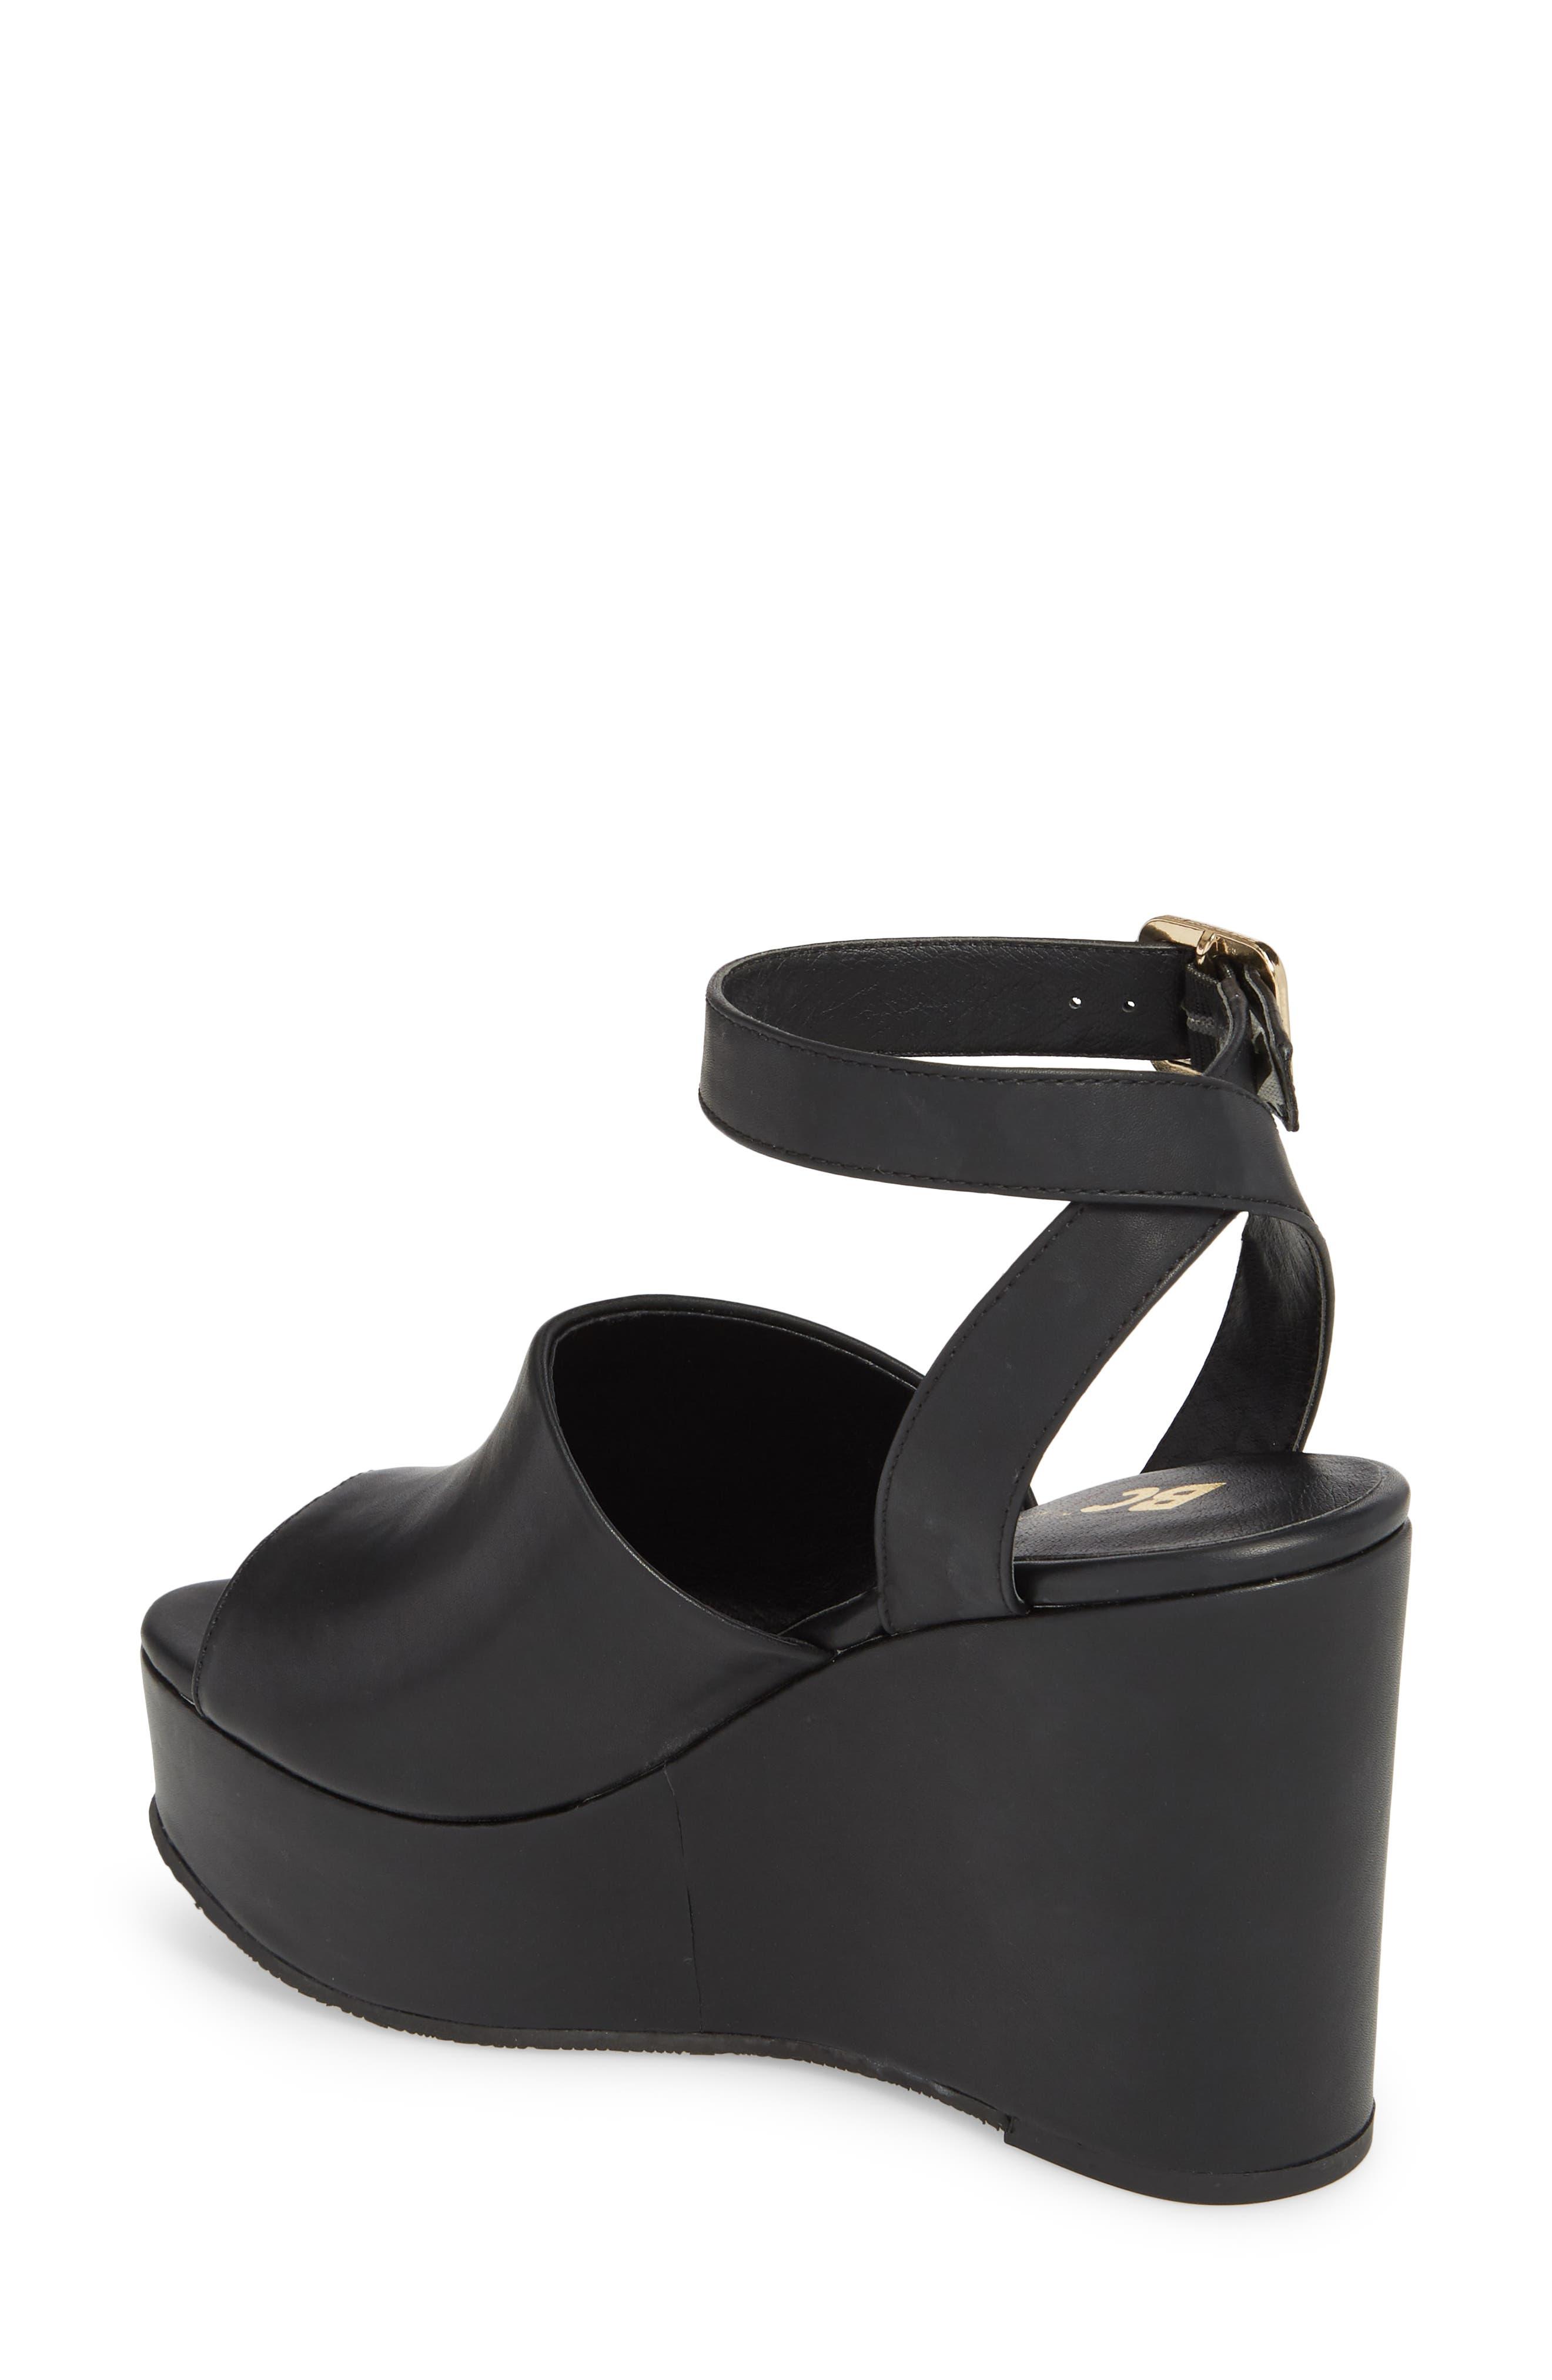 Admit One Platform Wedge Sandal,                             Alternate thumbnail 2, color,                             001